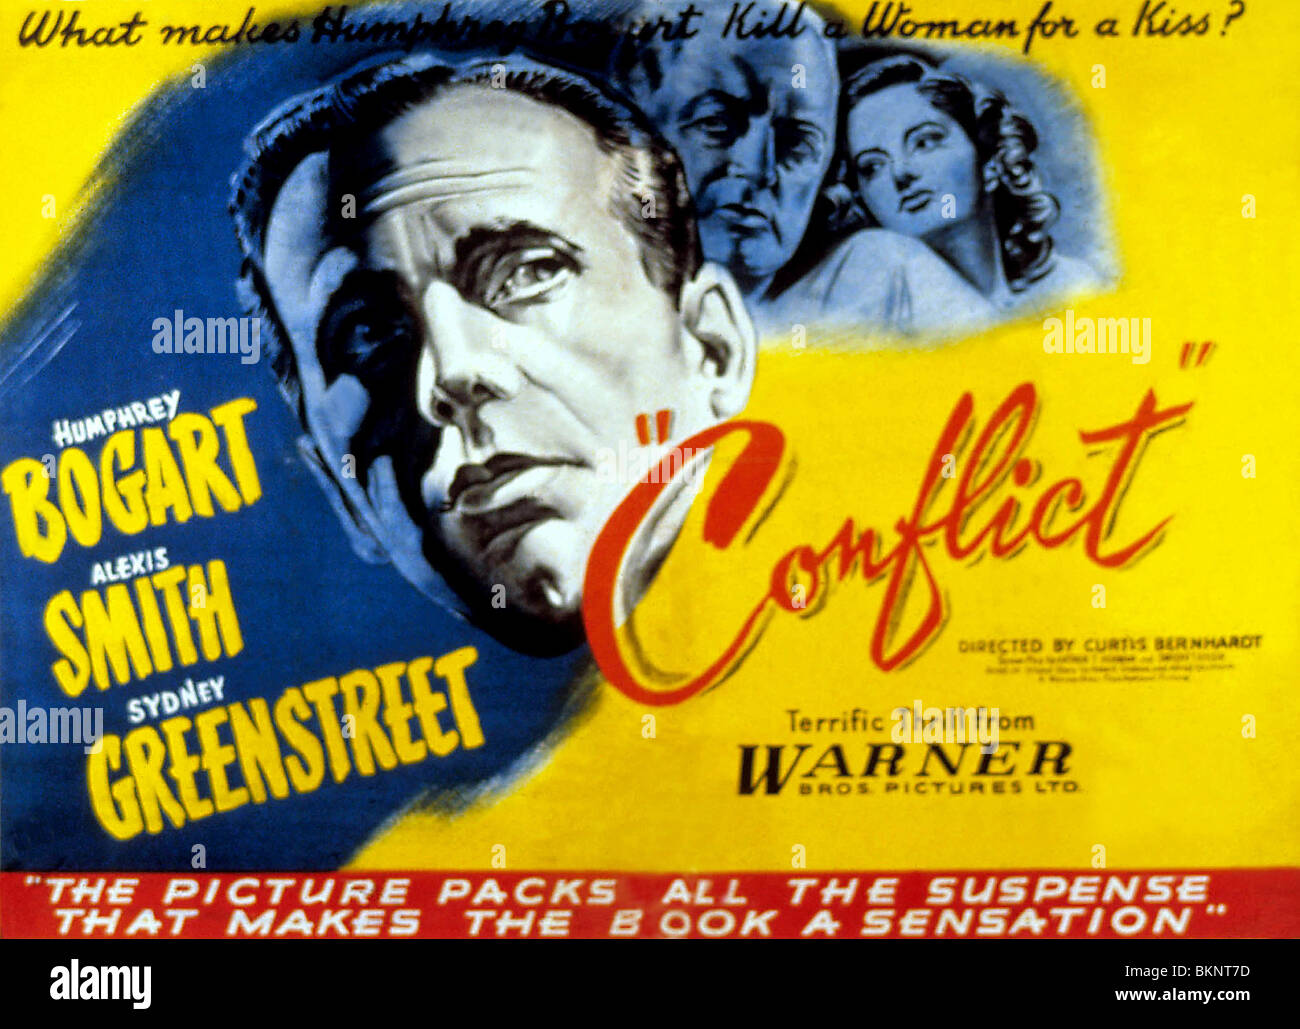 KONFLIKT (1945) CURTIS BERNHARDT (DIR), PLAKAT CFLT 003 Stockbild